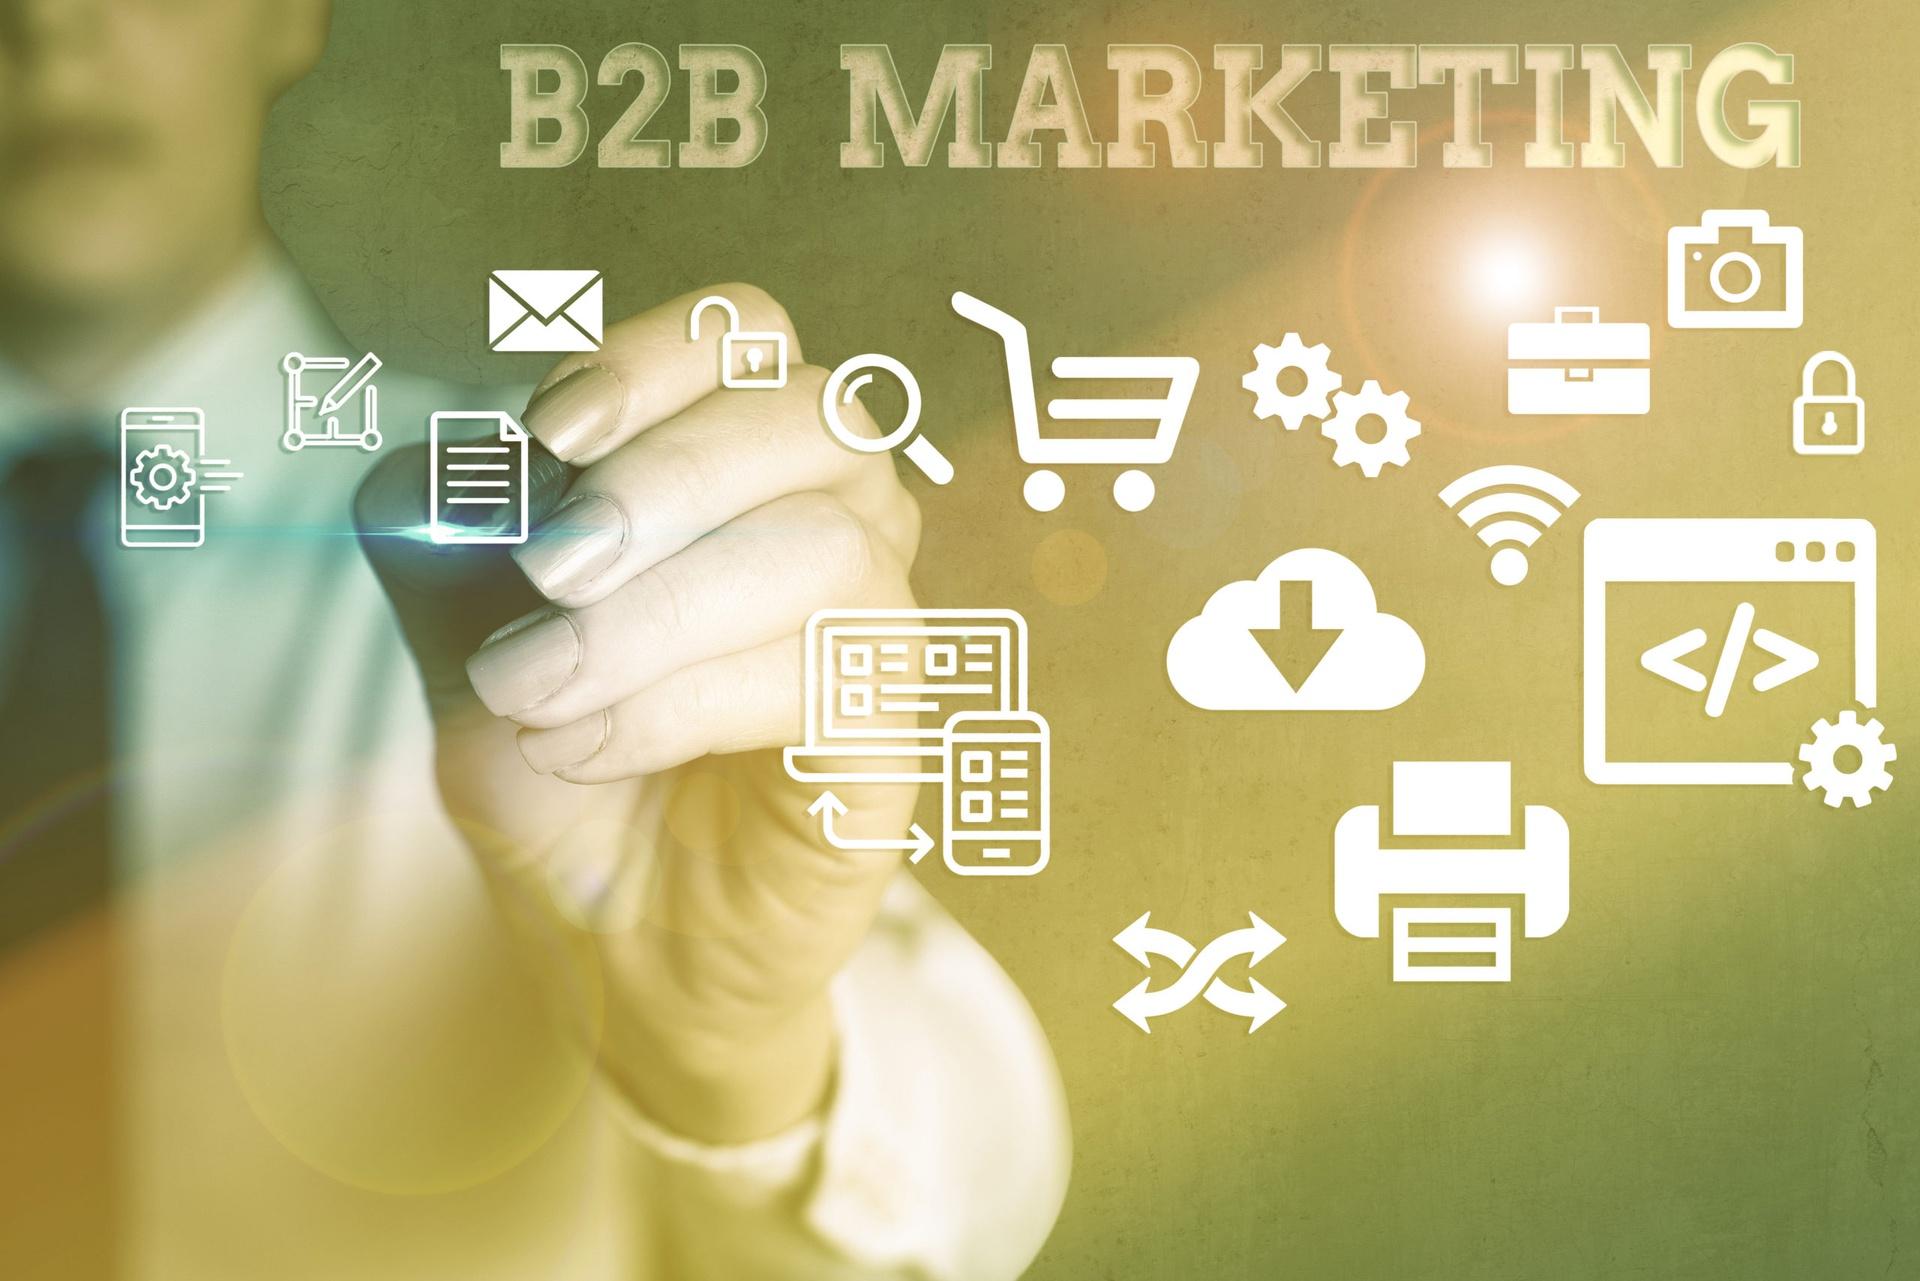 Essentials for a successful B2B marketing strategy